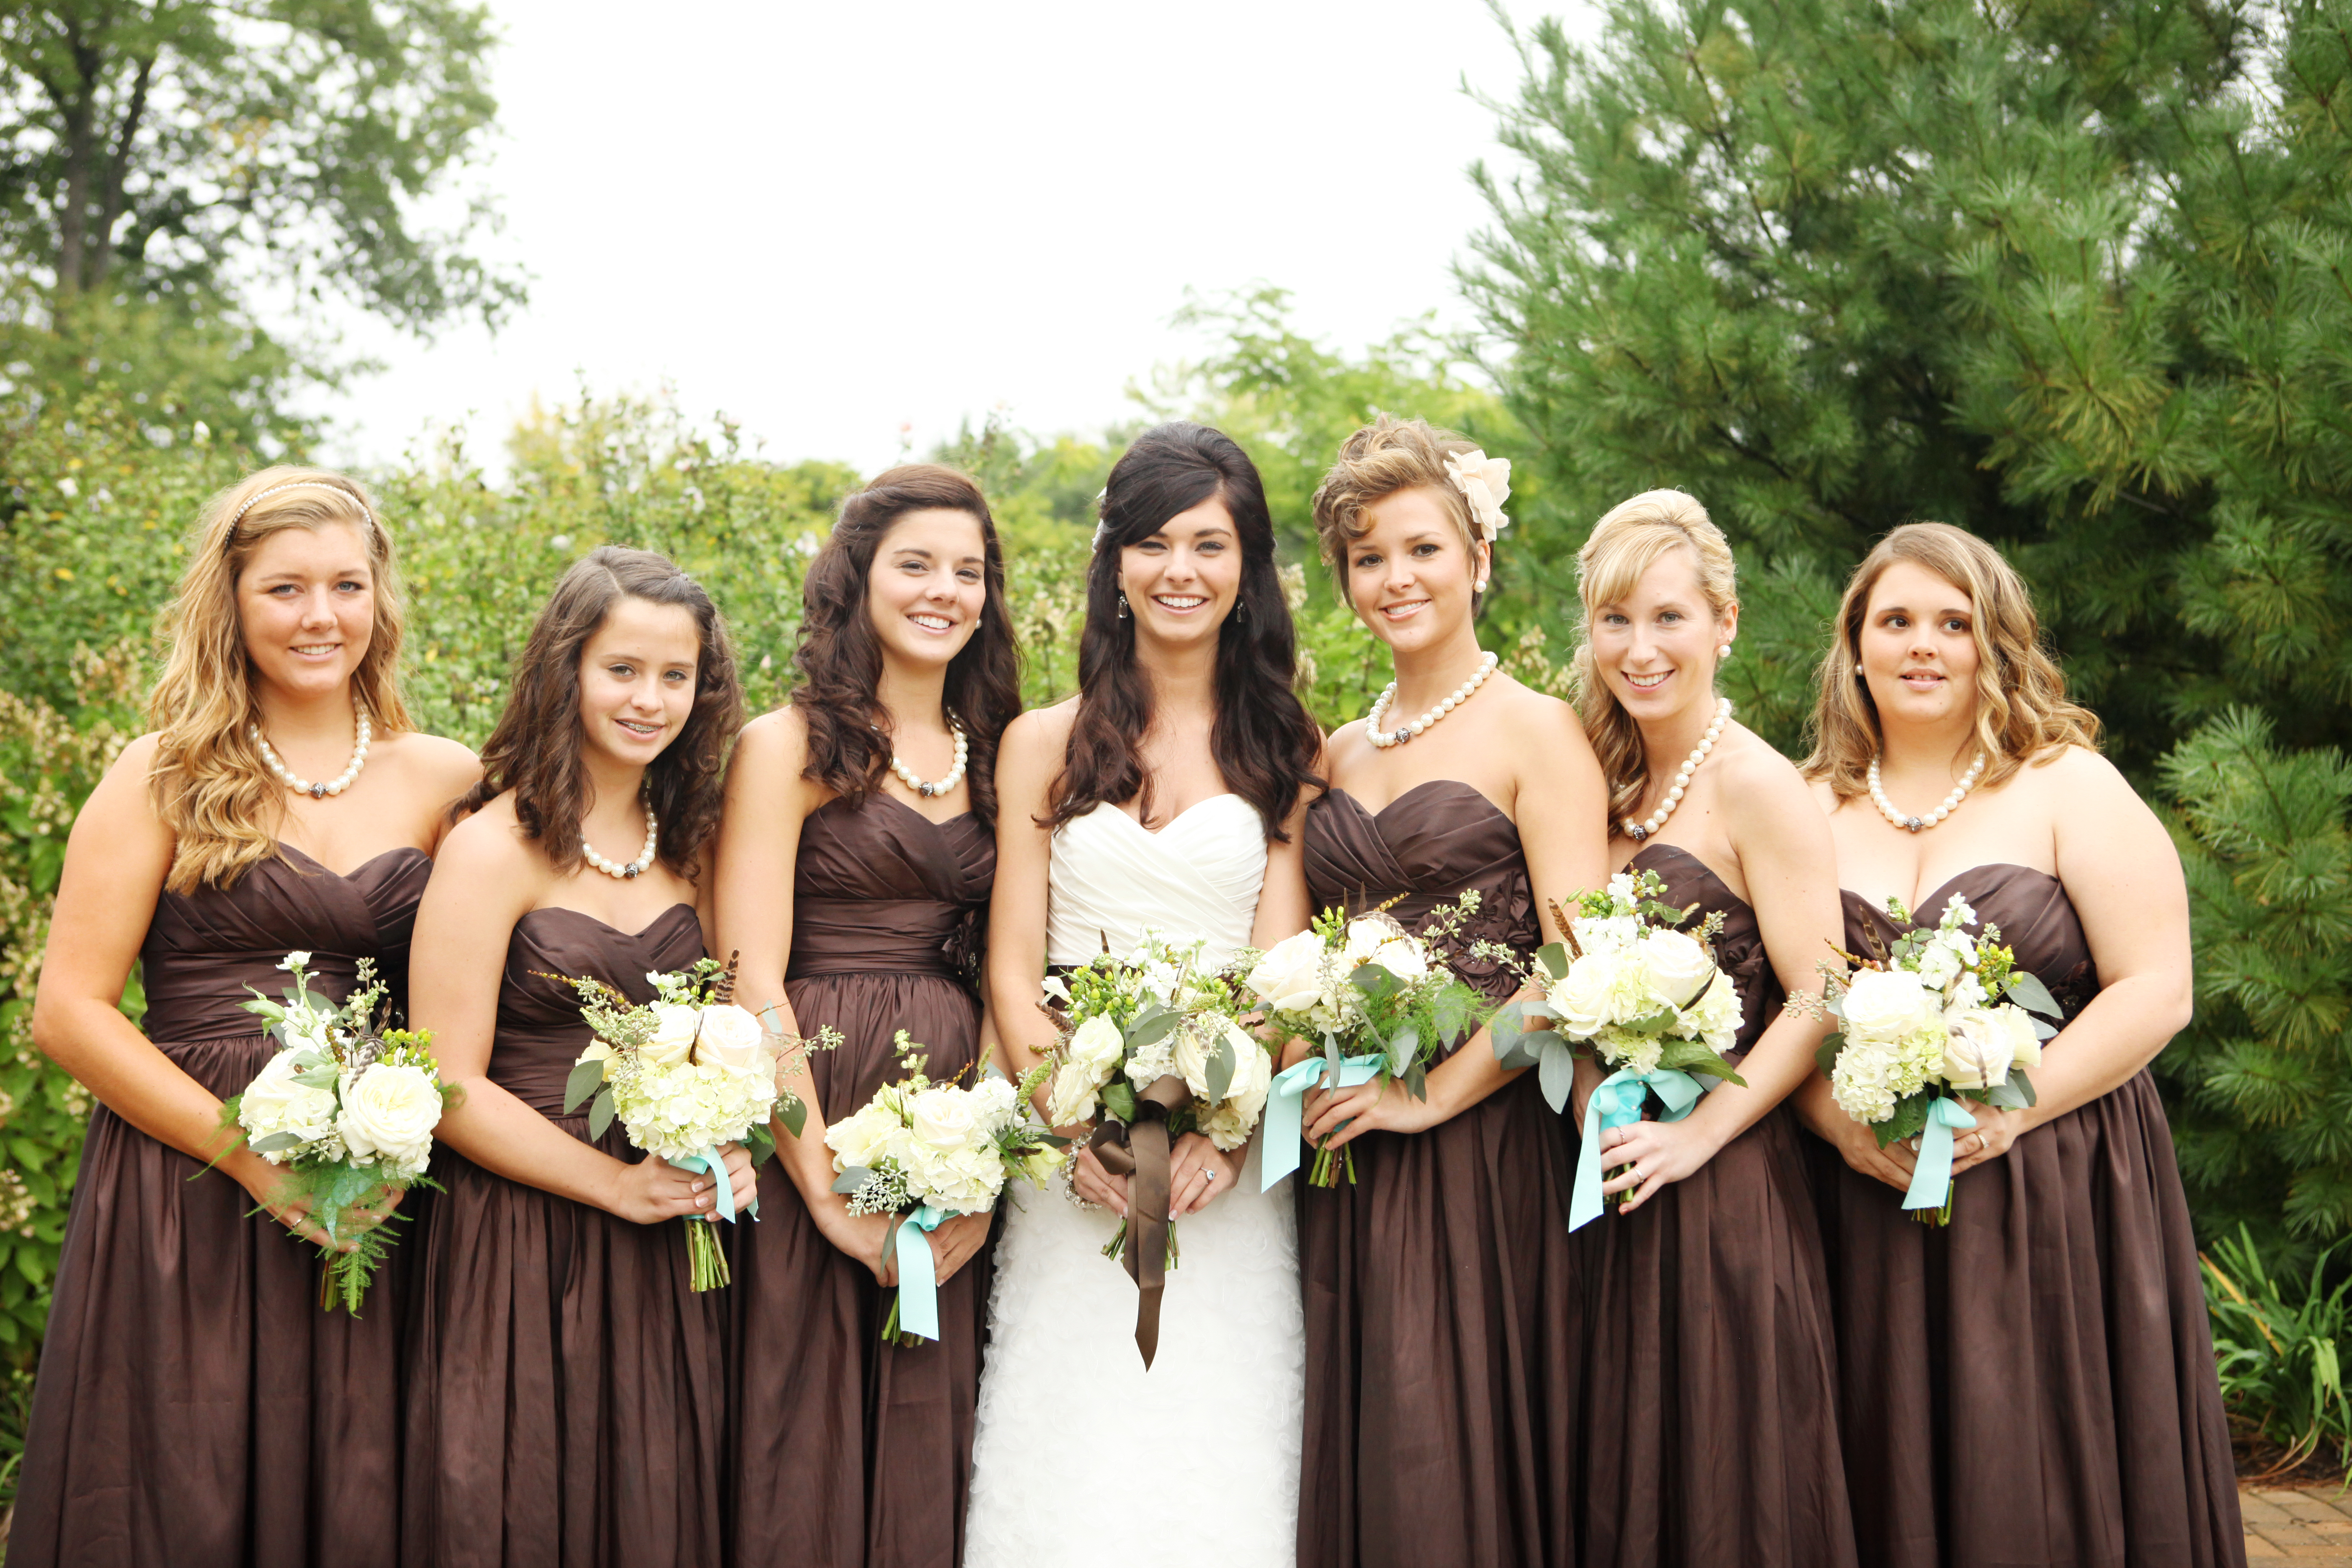 Bridesmaid Dresses, Fashion, Real Weddings, Wedding Style, brown, Fall Weddings, Northeast Real Weddings, Rustic Real Weddings, Fall Real Weddings, Garden Real Weddings, Garden Weddings, Rustic Weddings